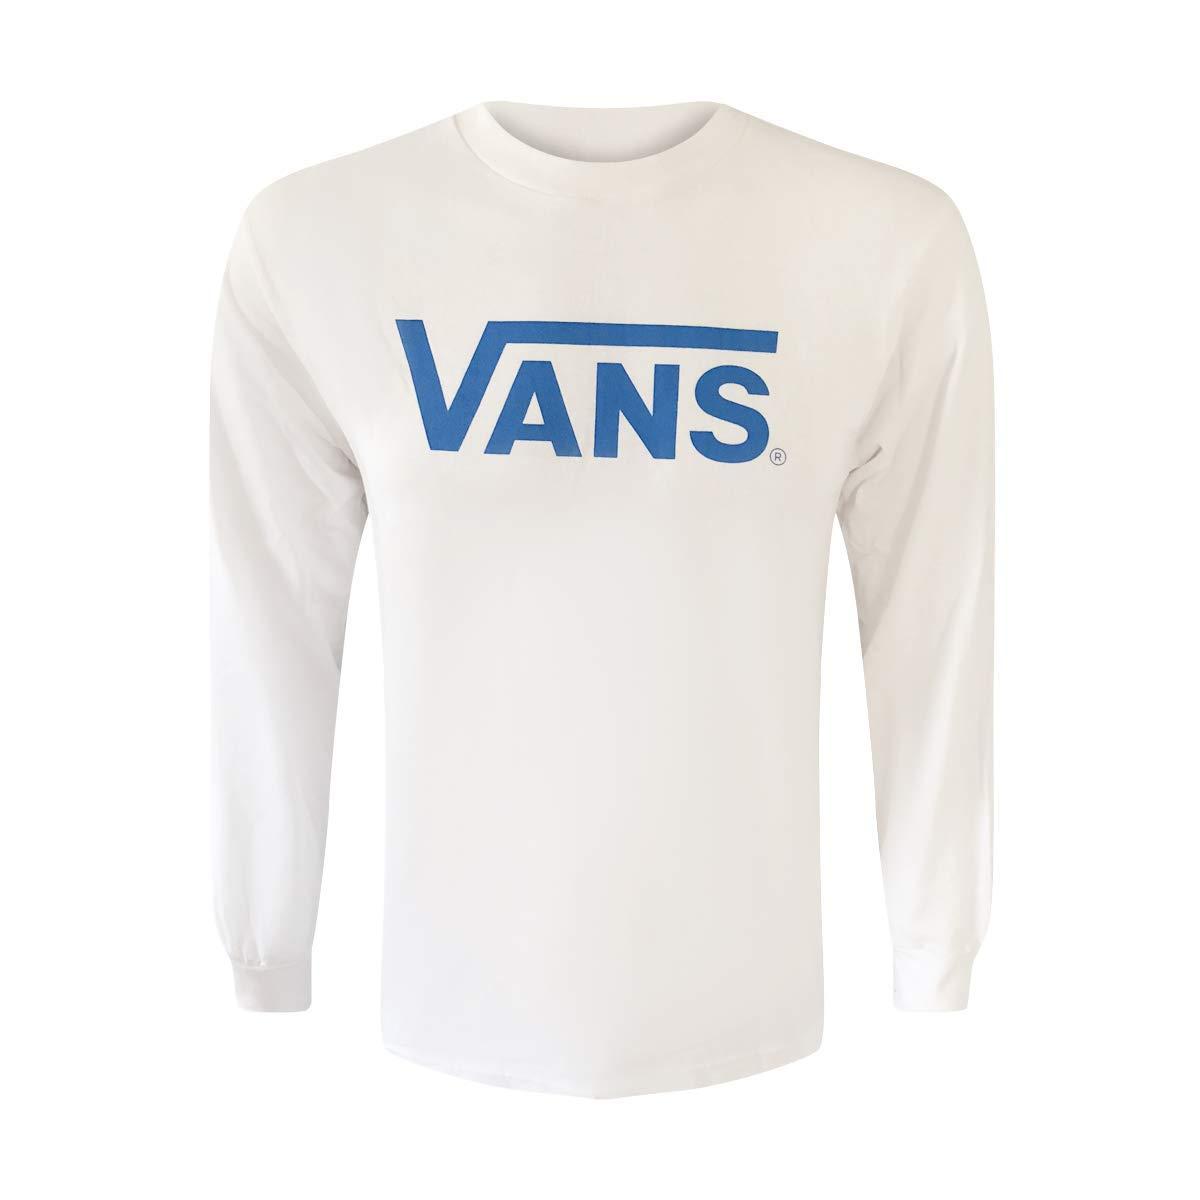 0864f4e8 Vans Boys Long-Sleeve Classic Logo T-Shirt Tee